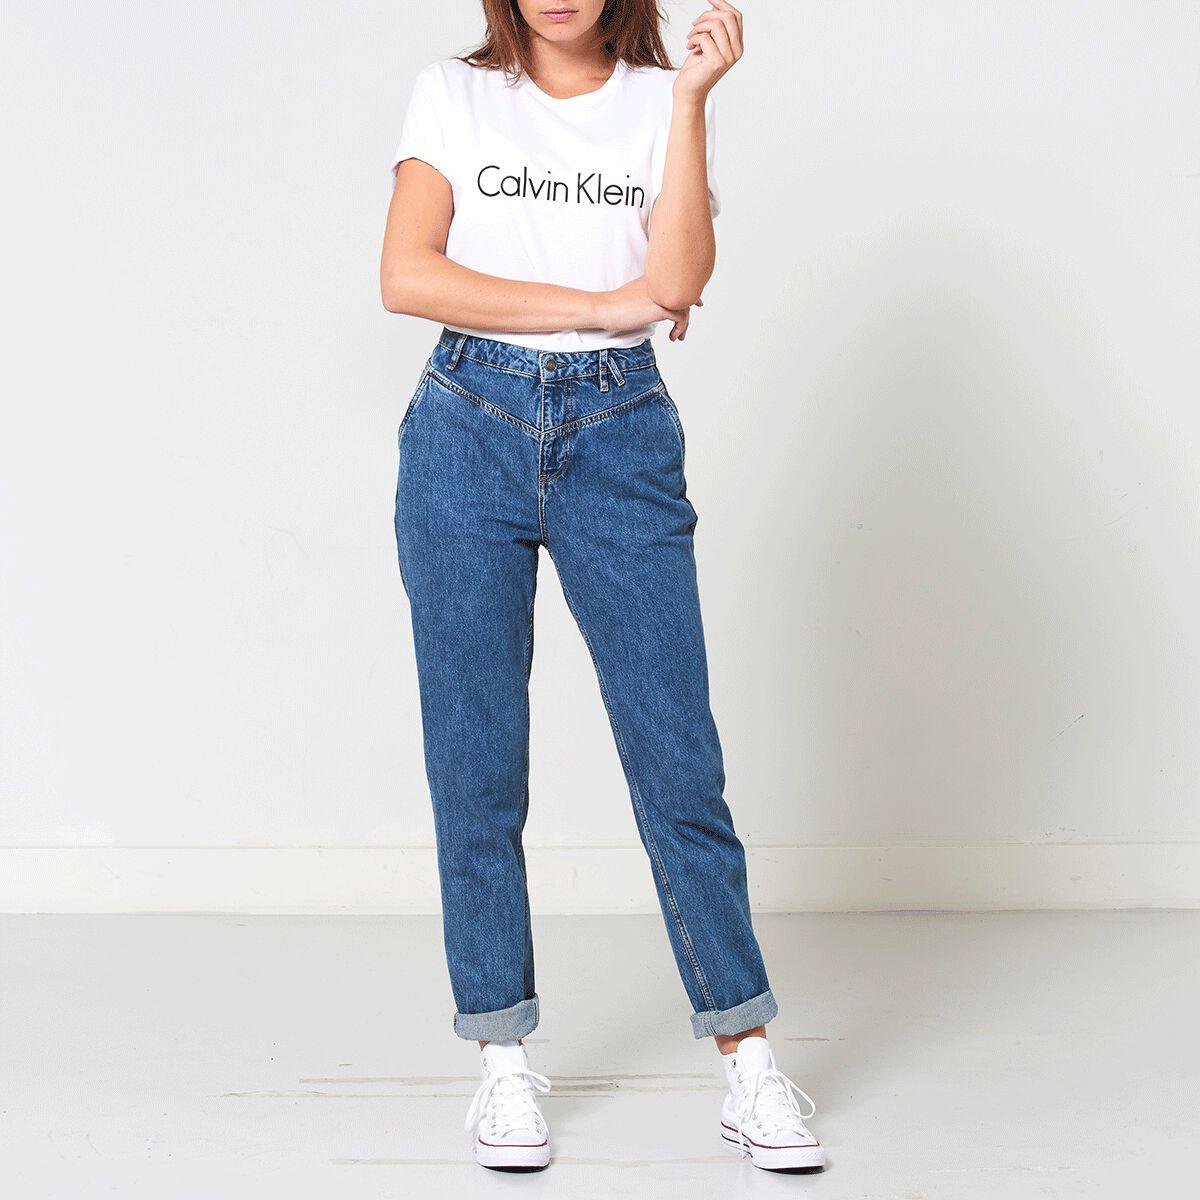 f34183a18 Women T-shirt Calvin Klein S/S Crew Neck White Buy Online